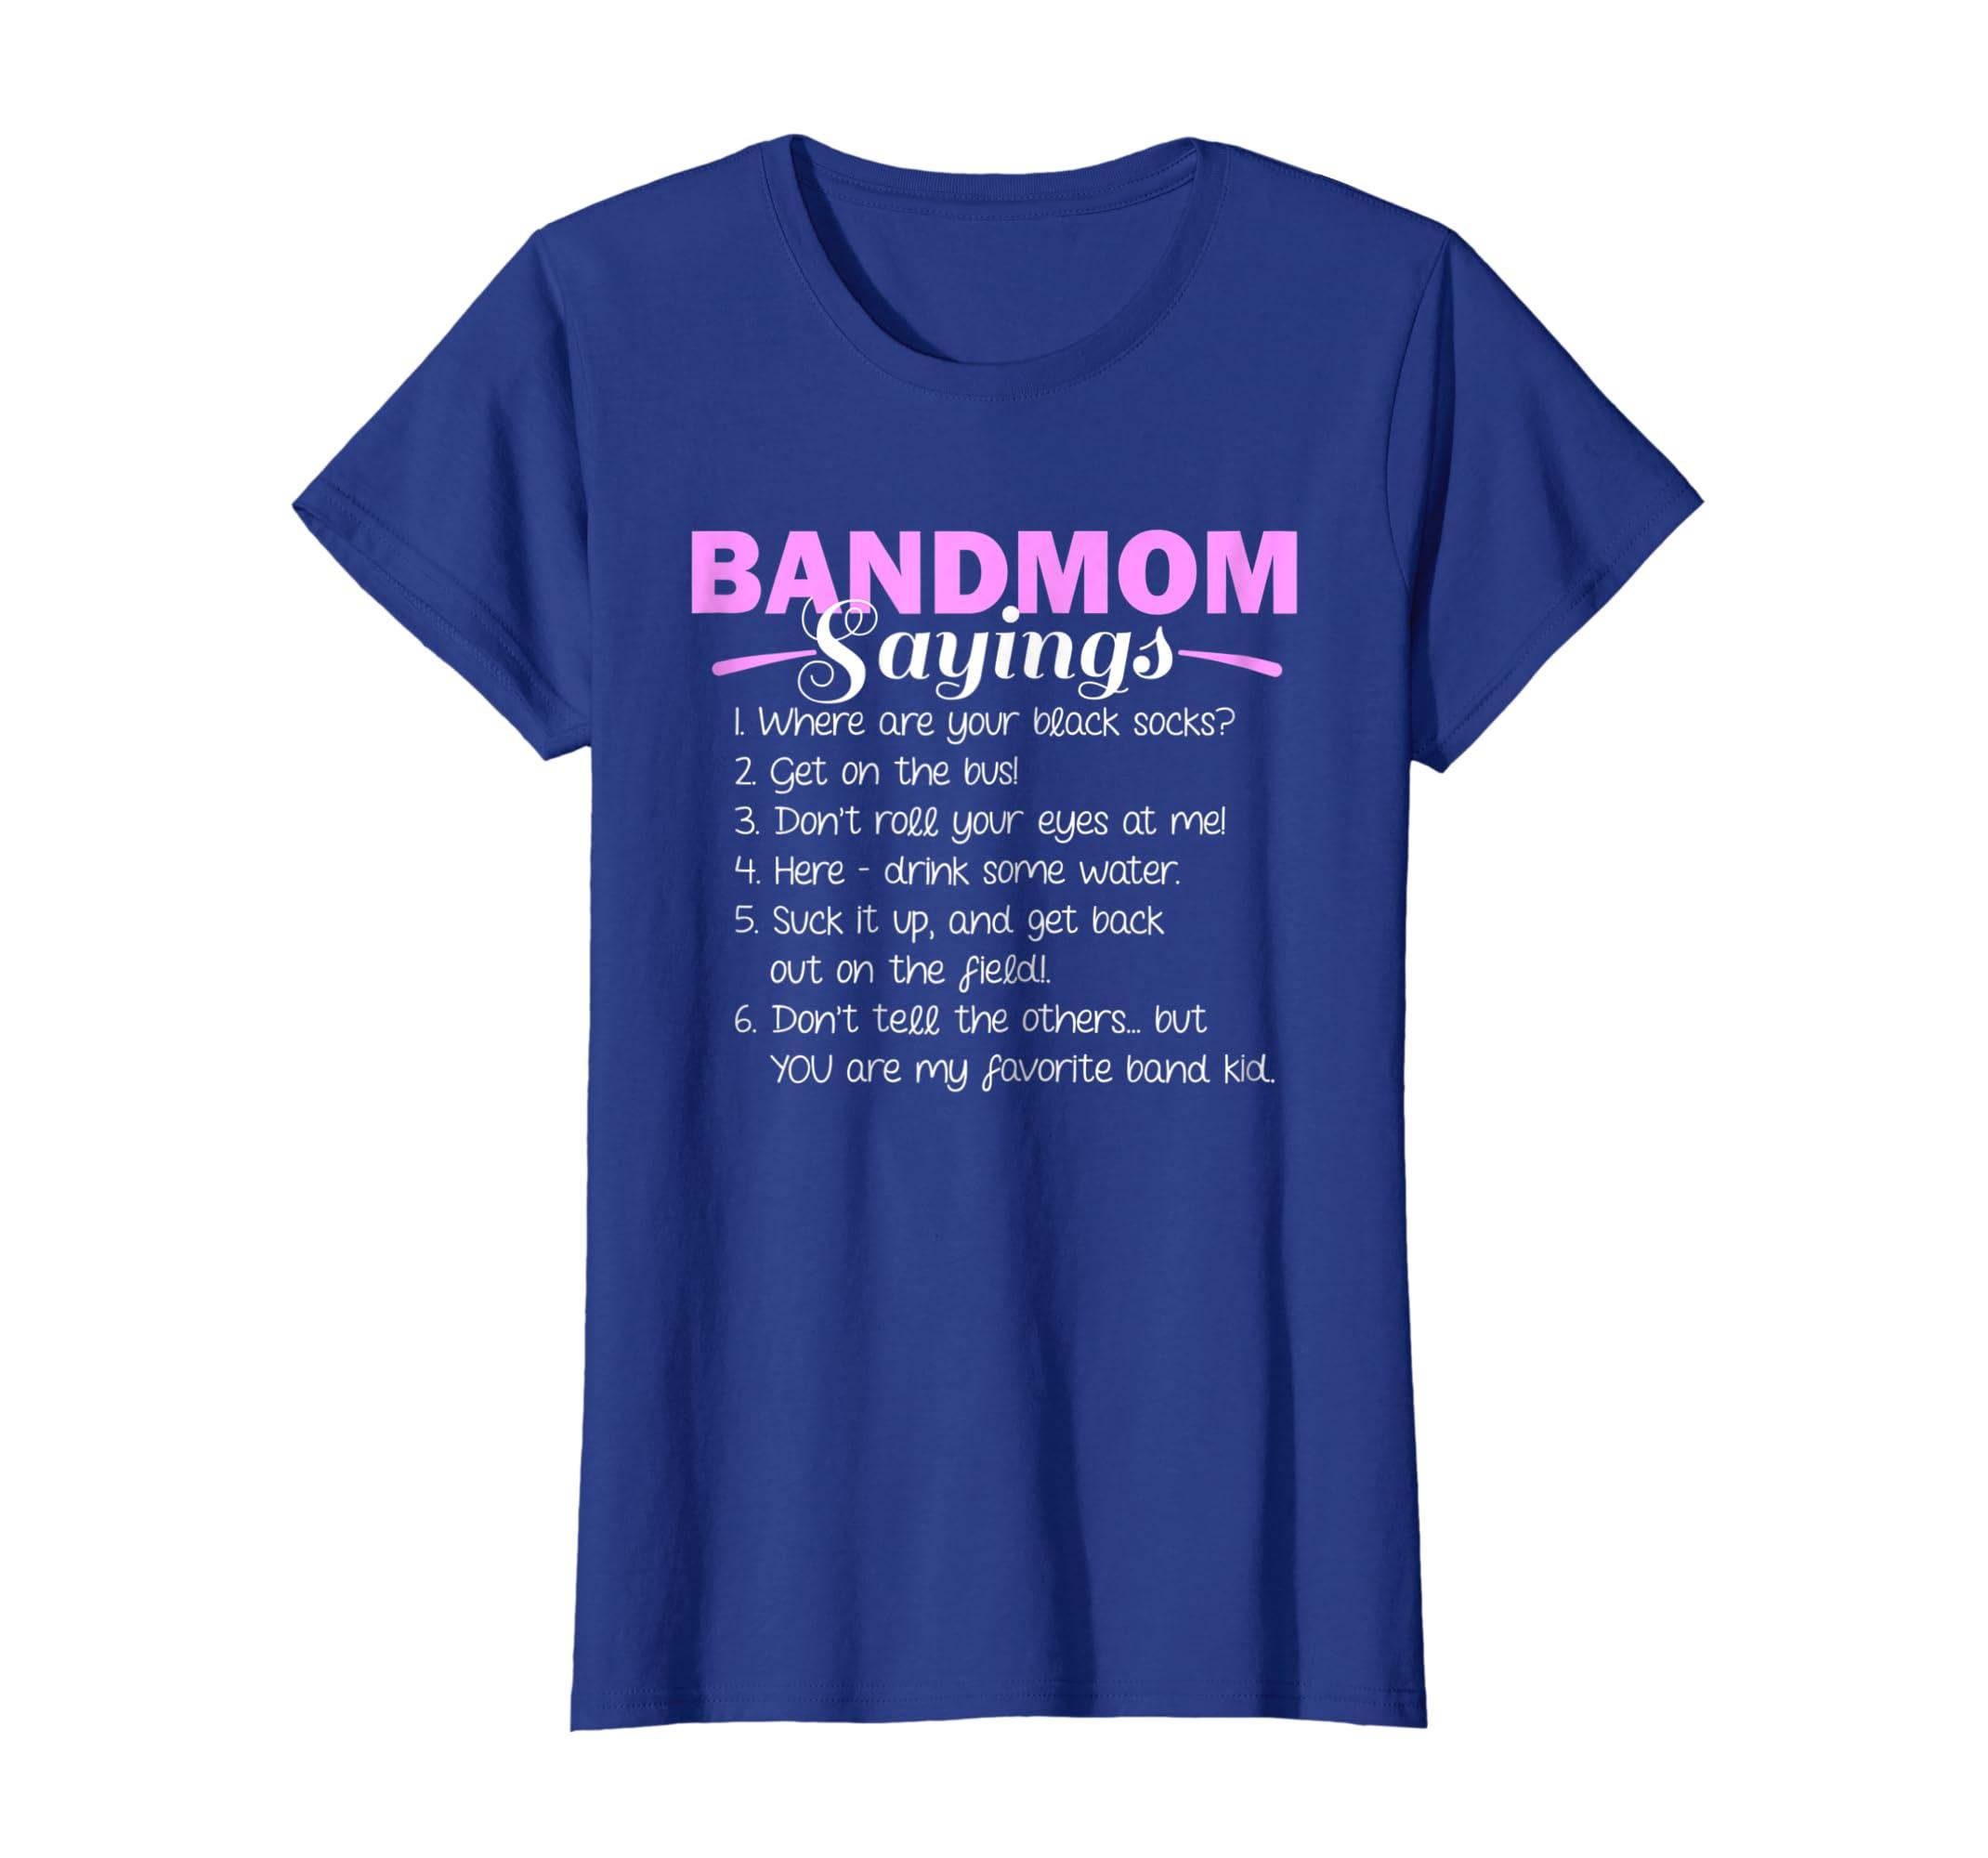 281cb491 Amazon.com: Funny Marching Band T Shirts Music Fan Mom Music School Team:  Clothing